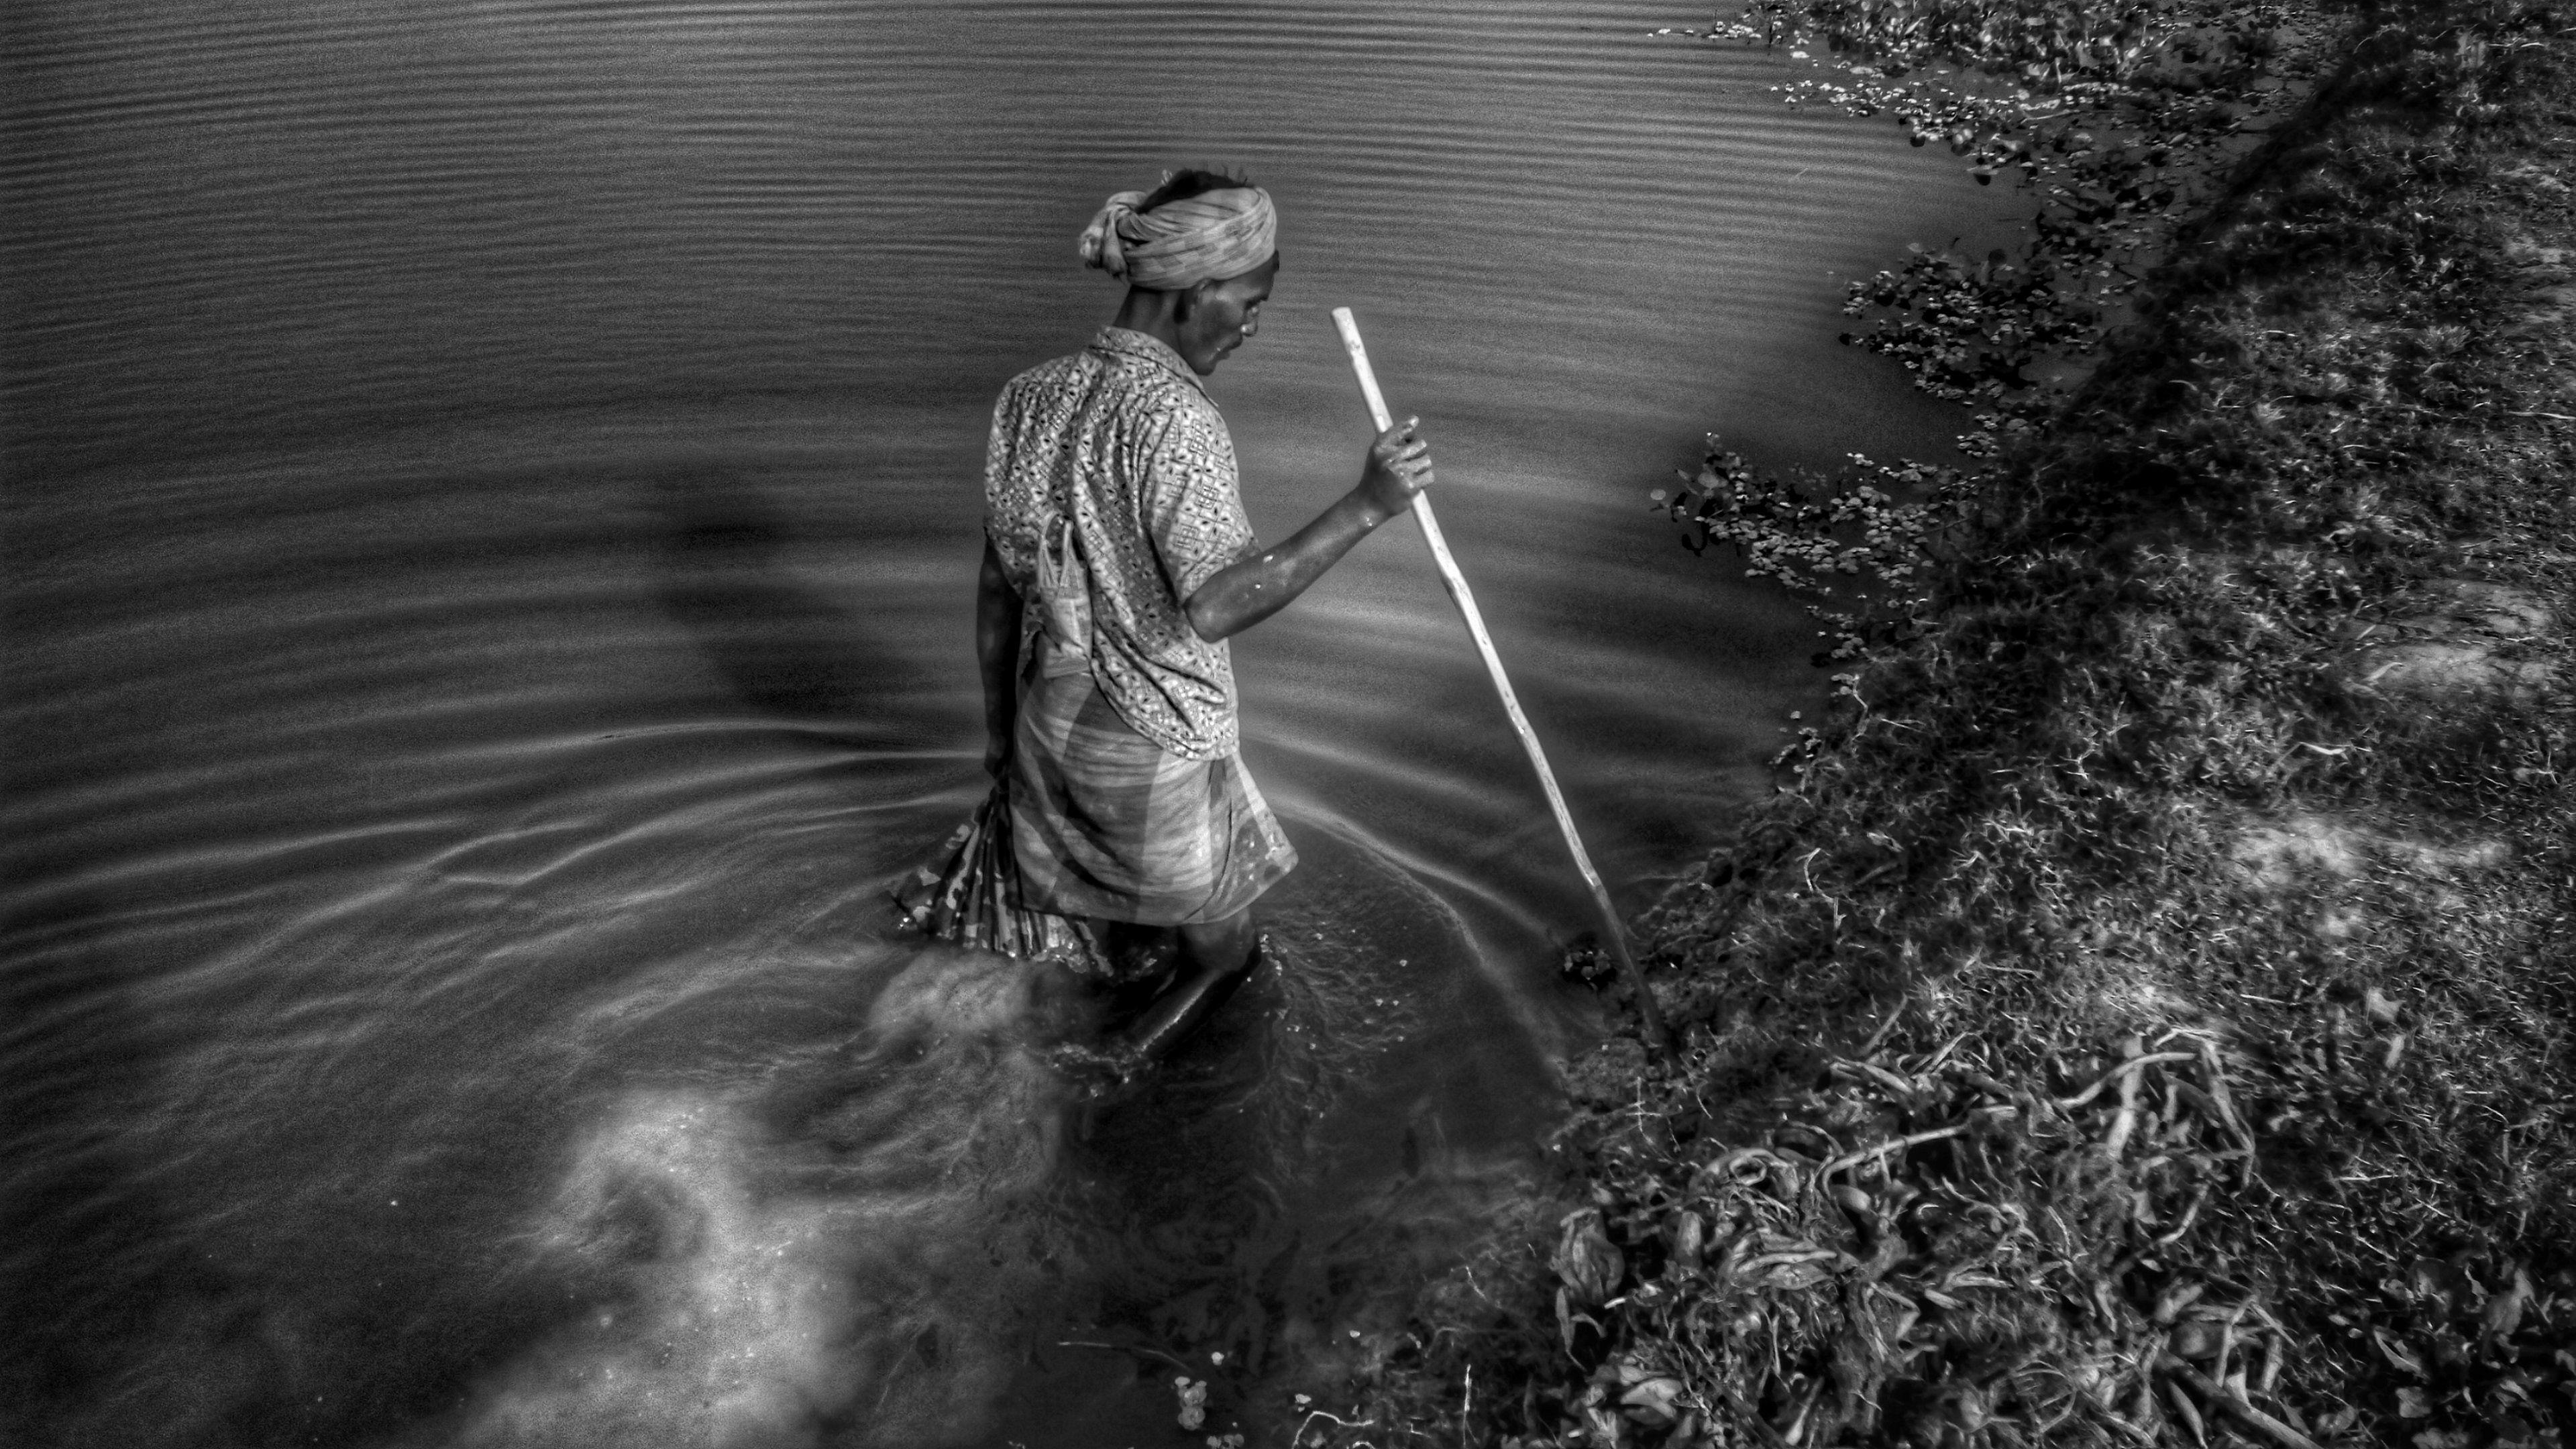 Expert Fish Hunter Searching 38402160 Hd Wallpaper Computer Wallpaper Wallpaper